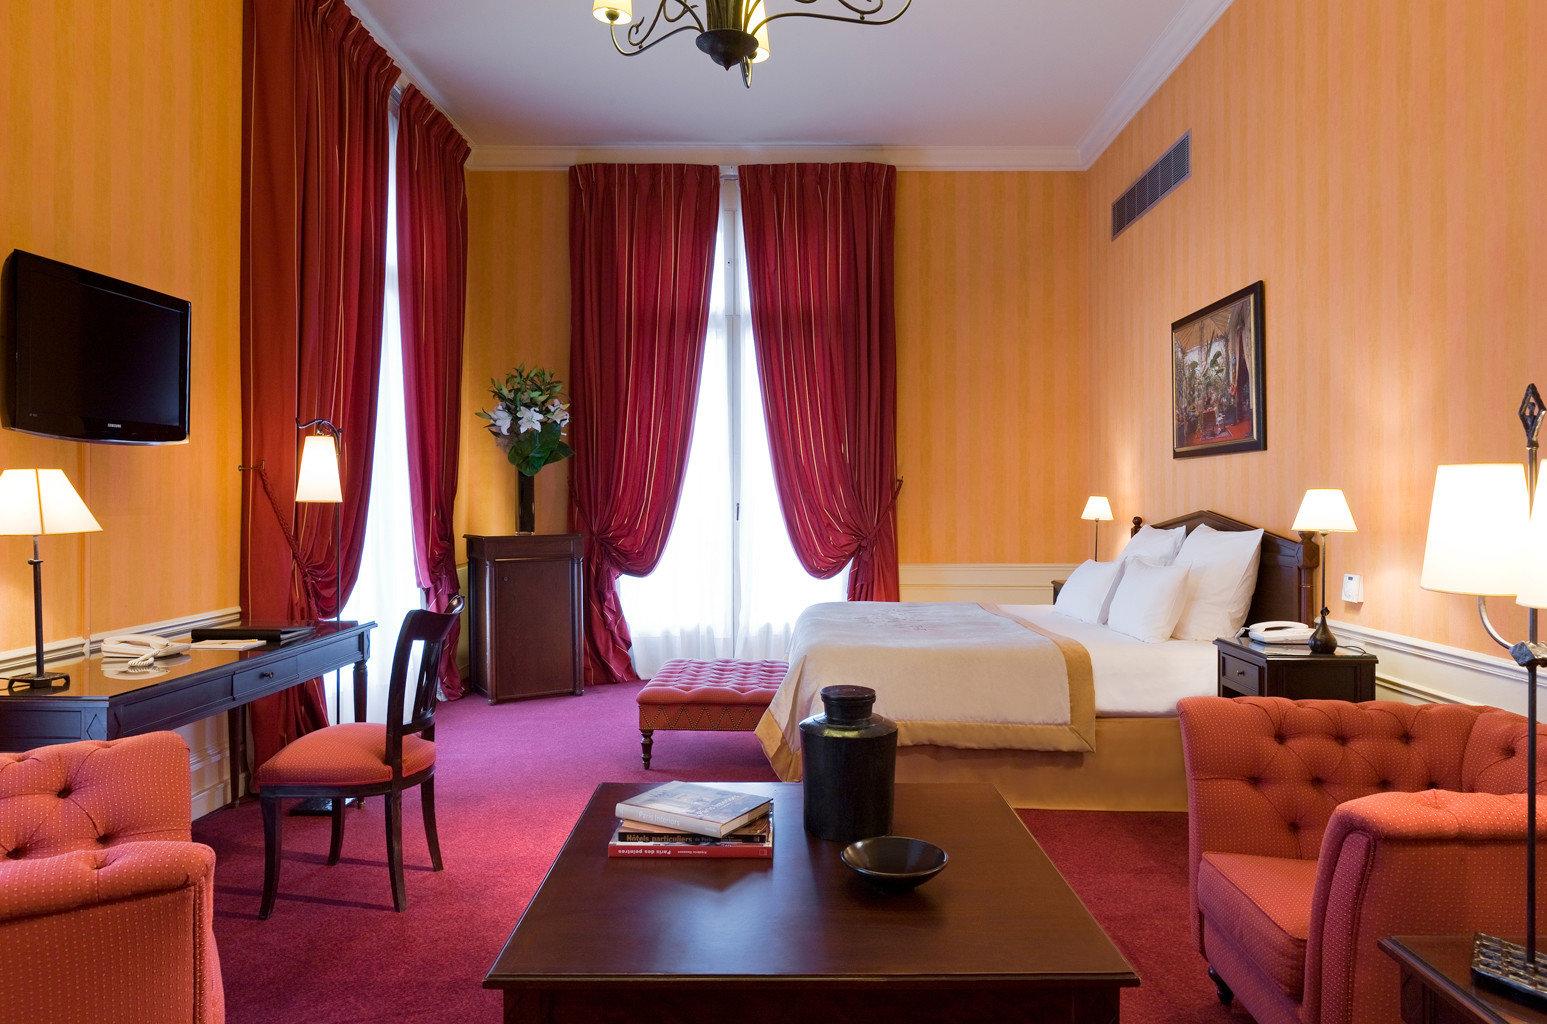 Bedroom Elegant Luxury Modern Suite red property Resort living room flat lamp leather